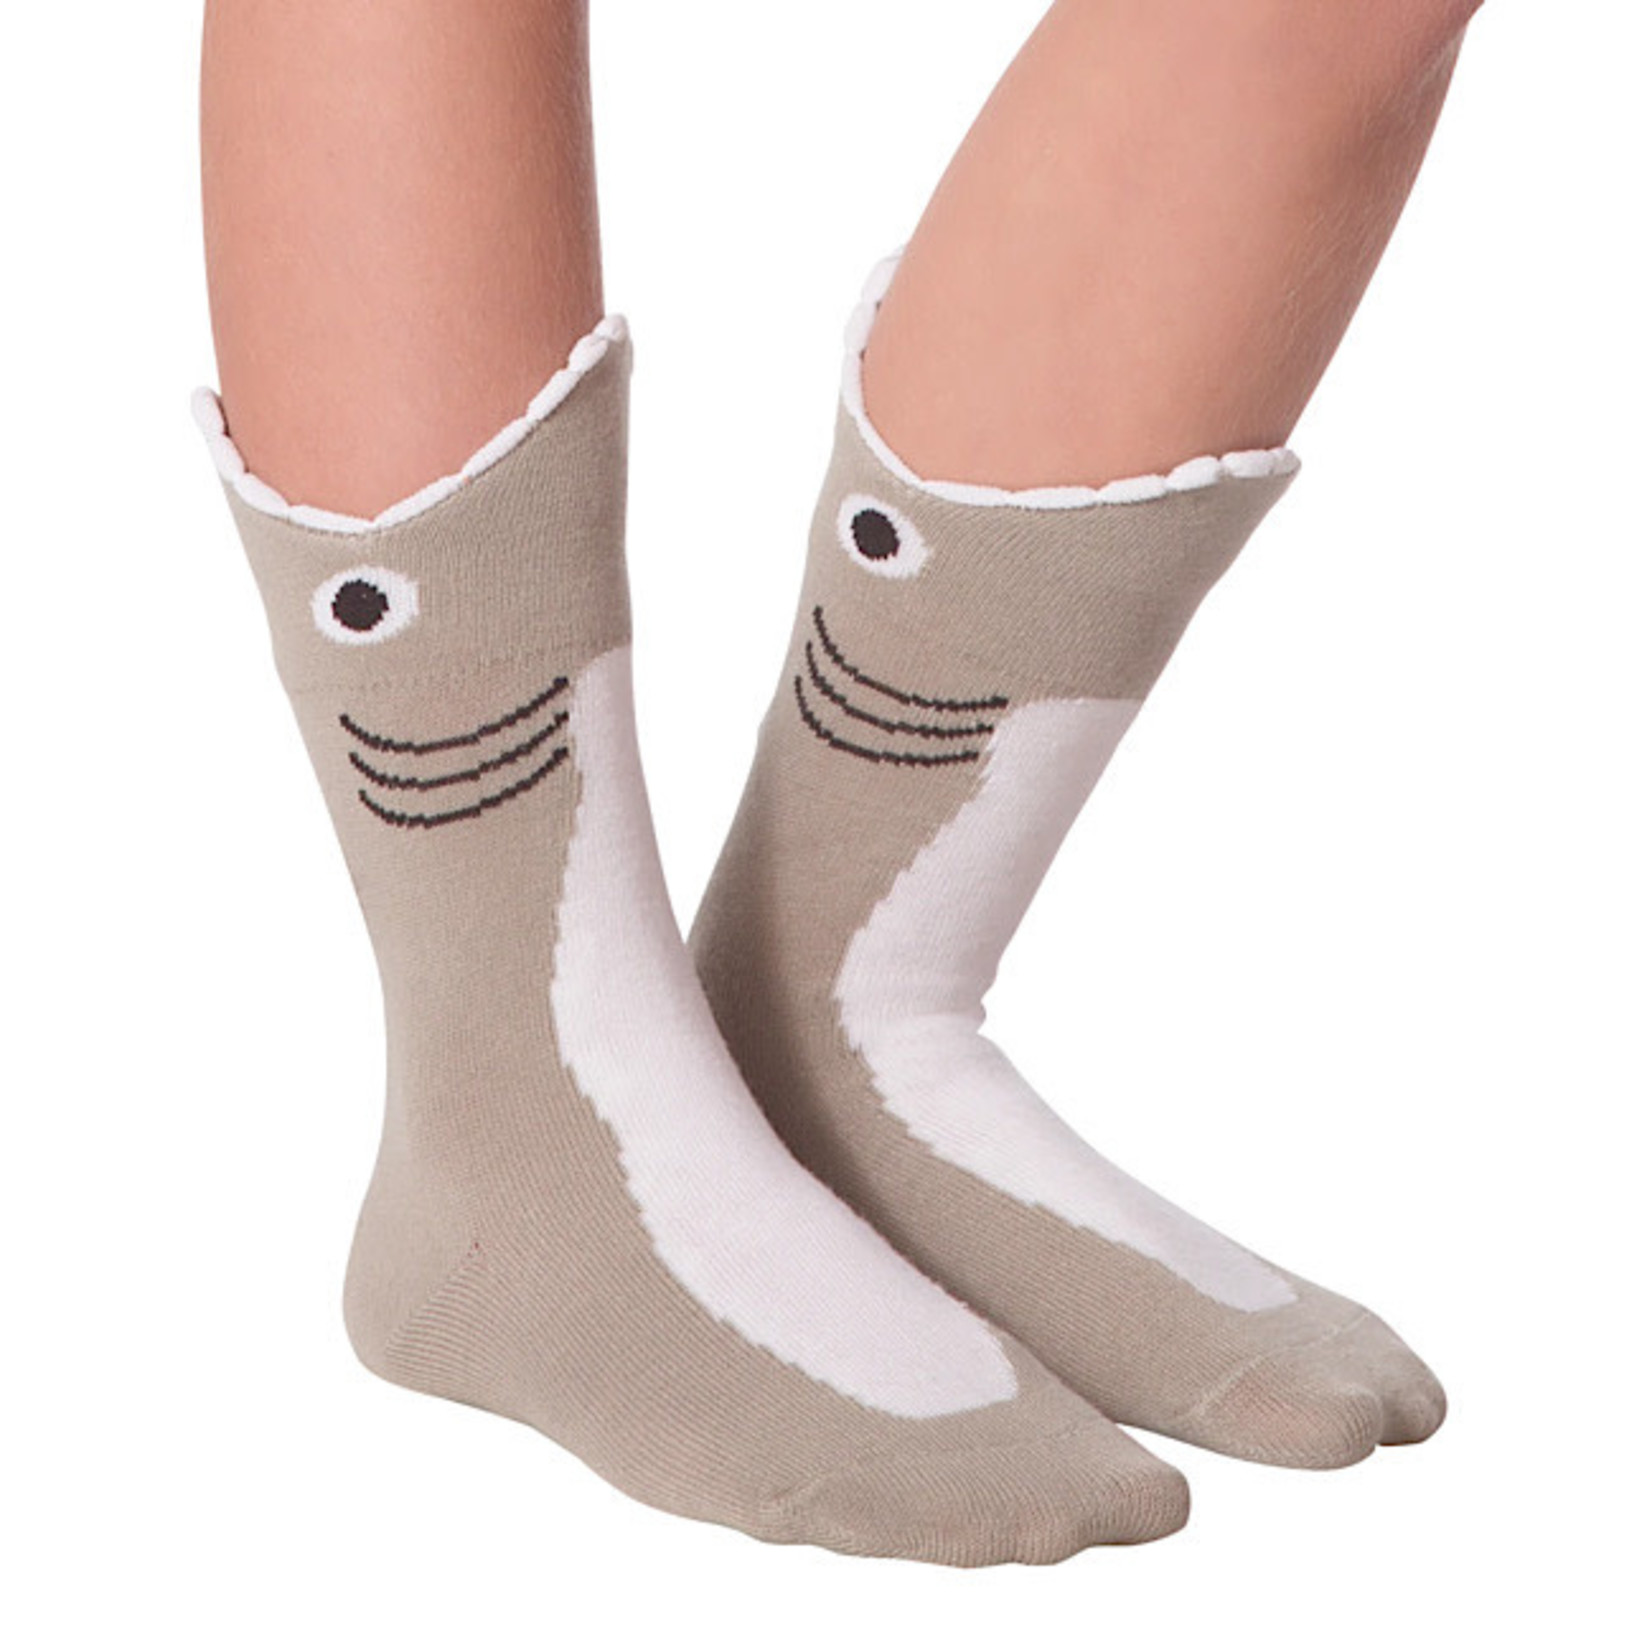 Socks (Kids) - Wide Mouth Shark